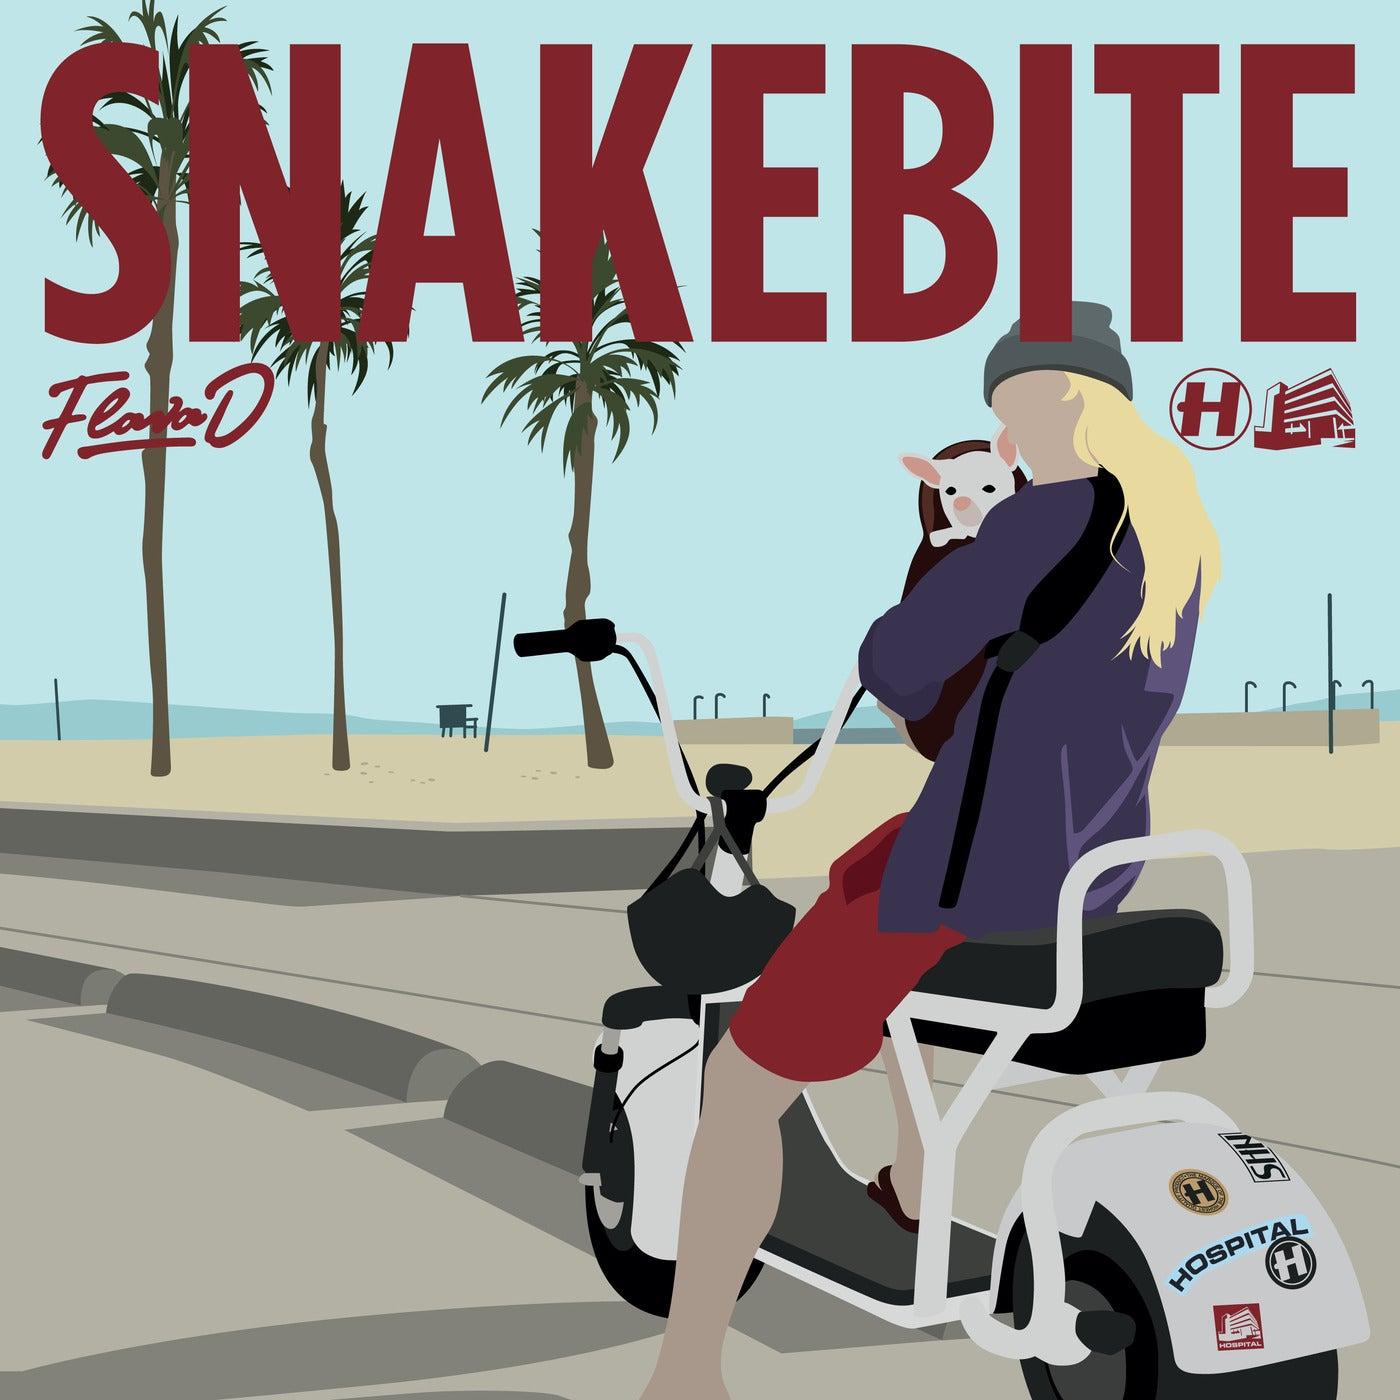 Snakebite (Original Mix)